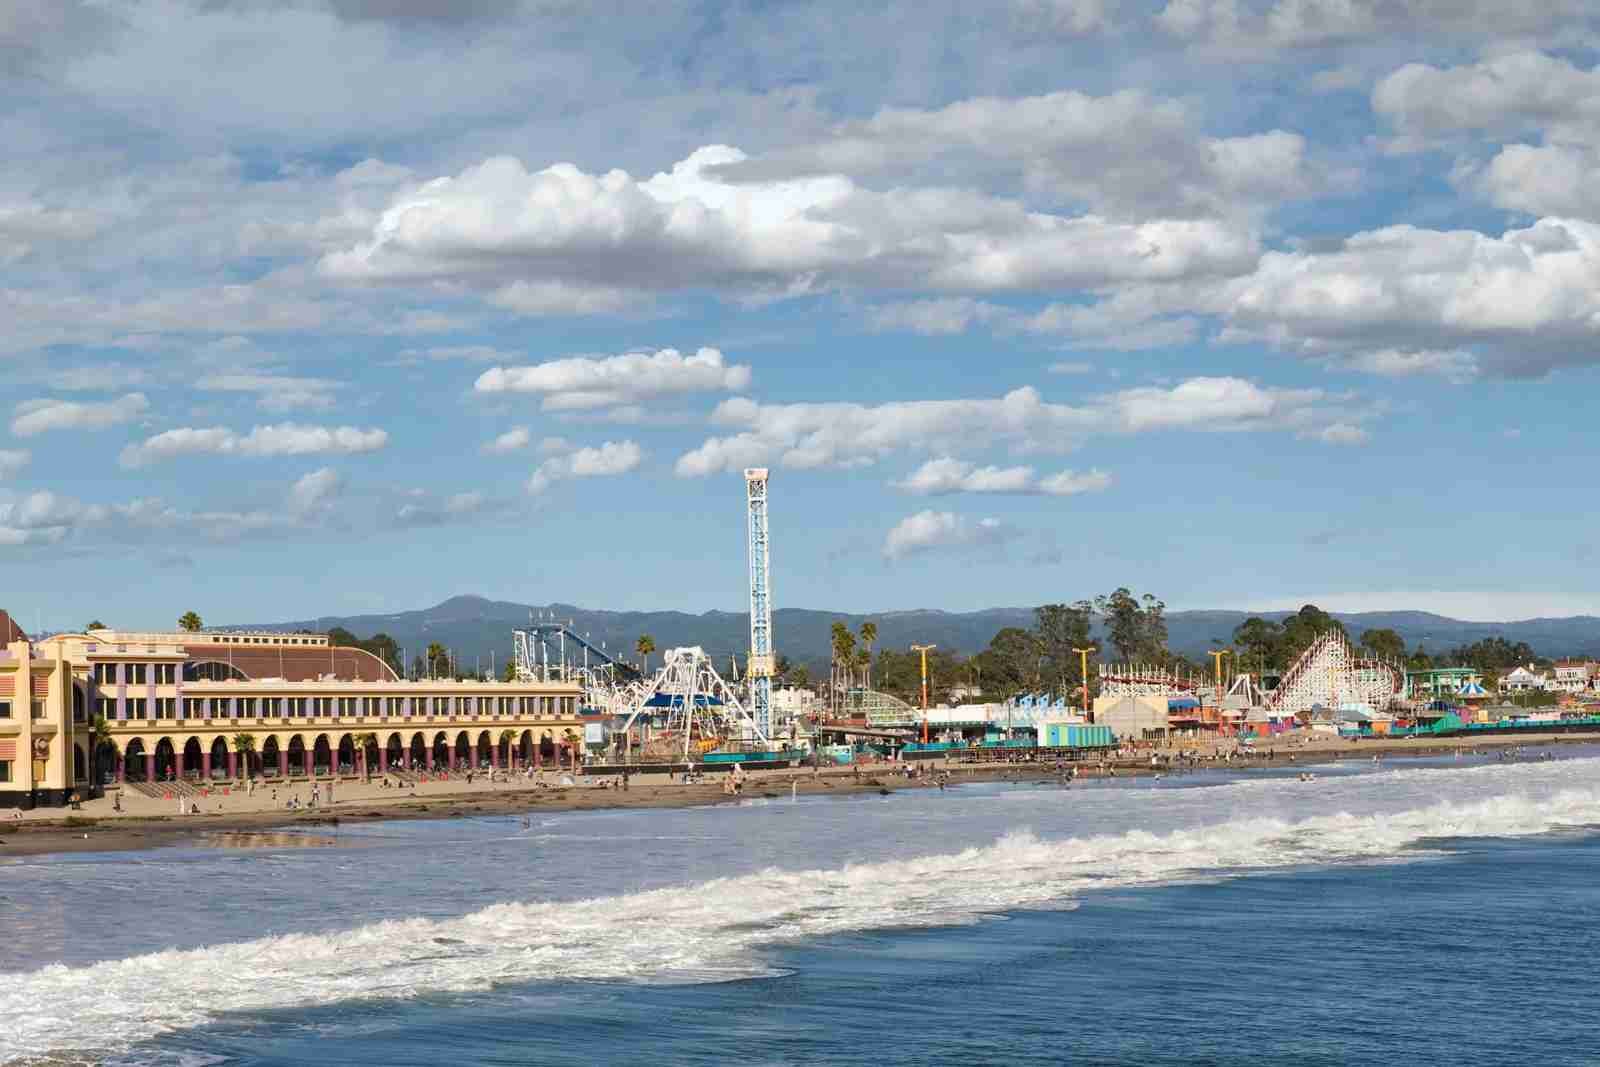 The Santa Cruz Boardwalk. (Photo by ivanastar/Getty Images)